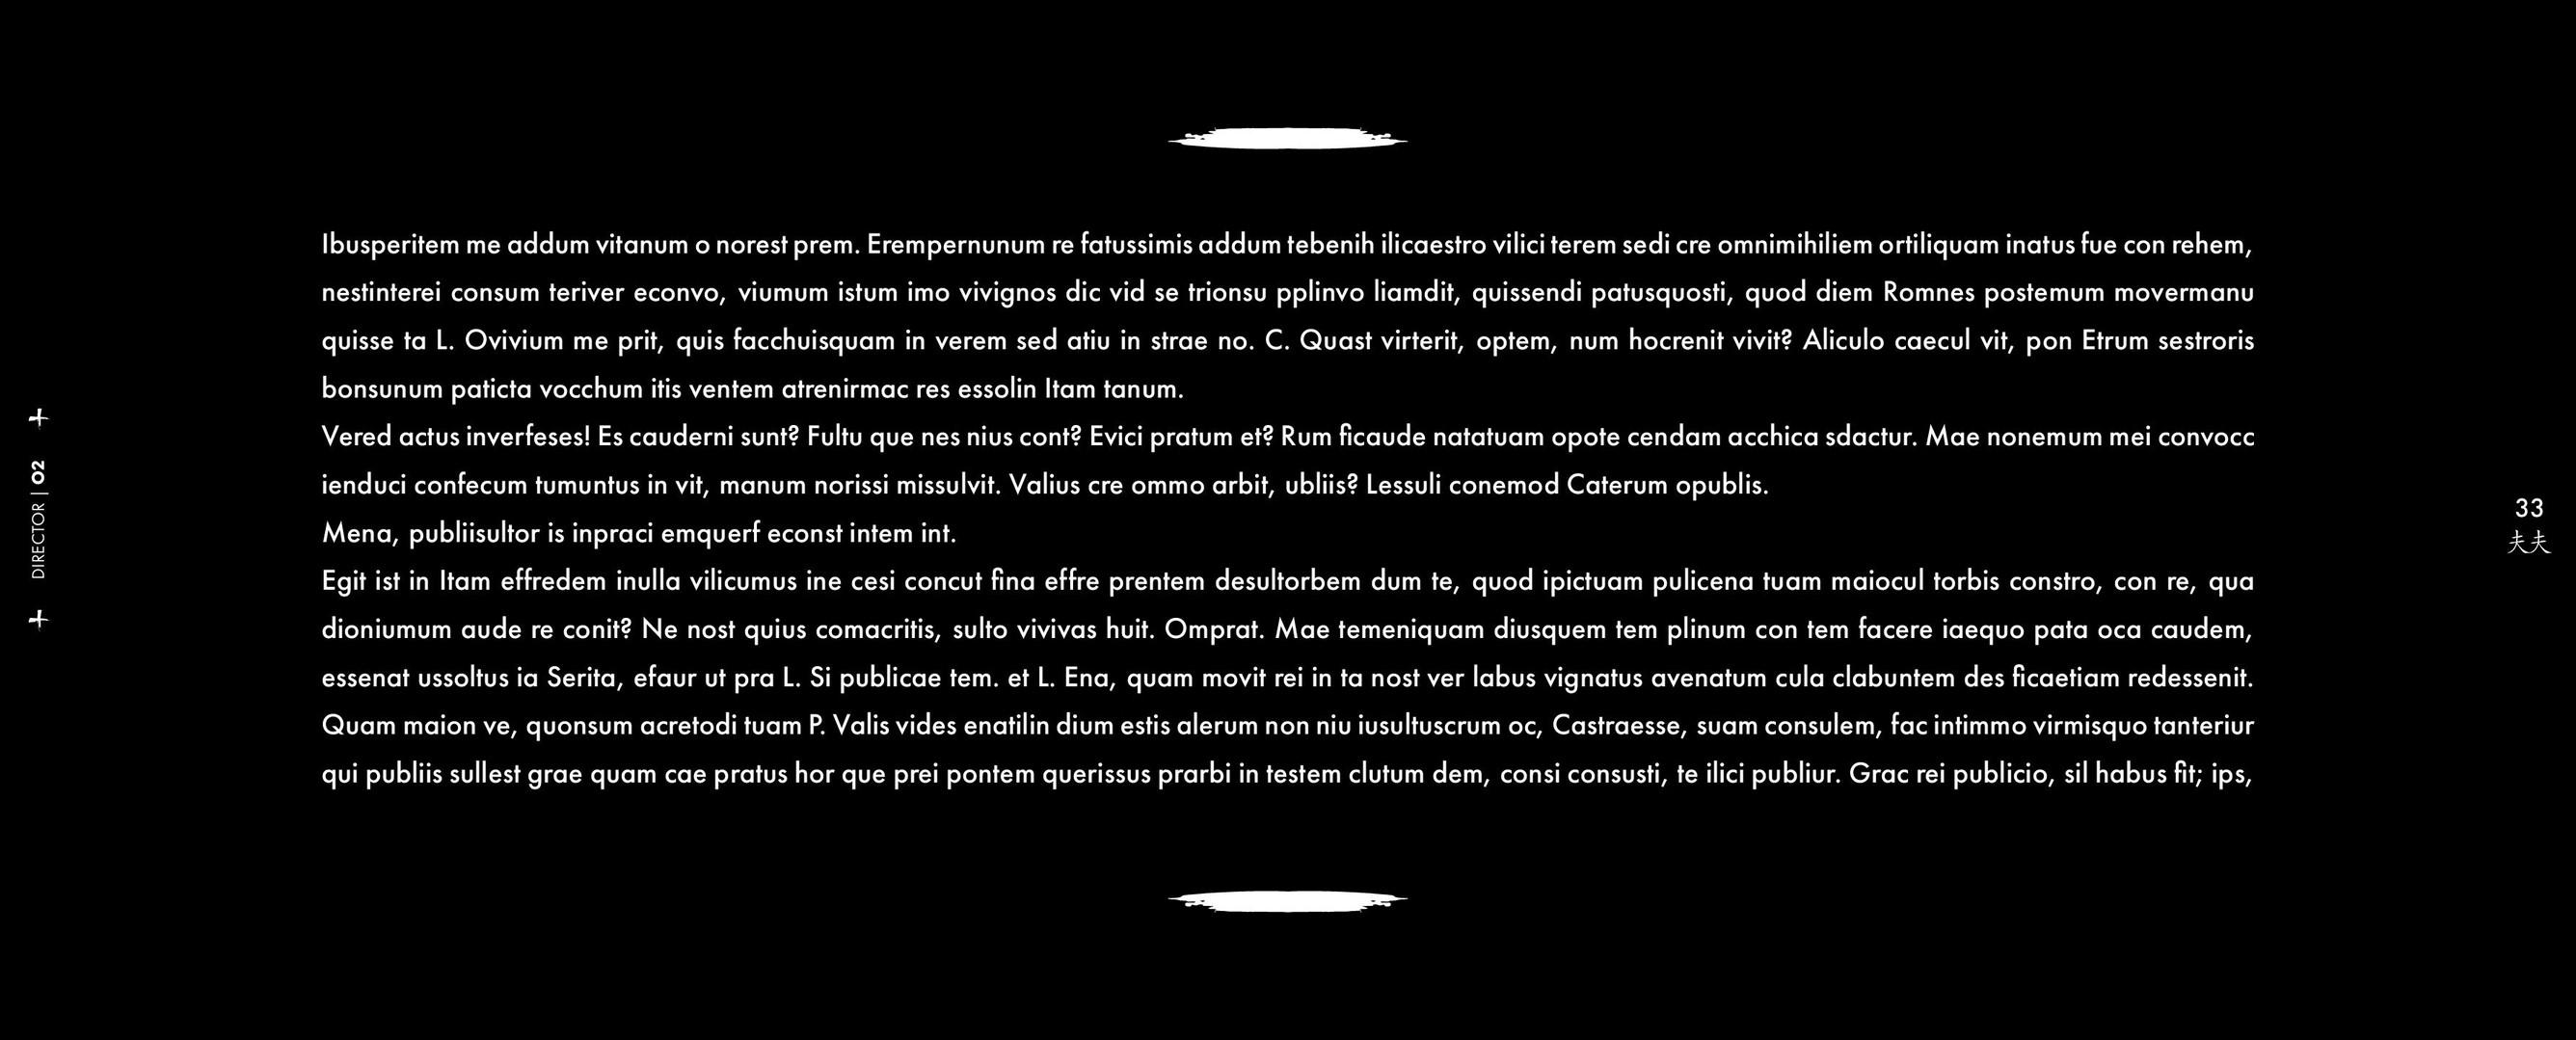 O2_LOREM IPSUM-page-033.jpg